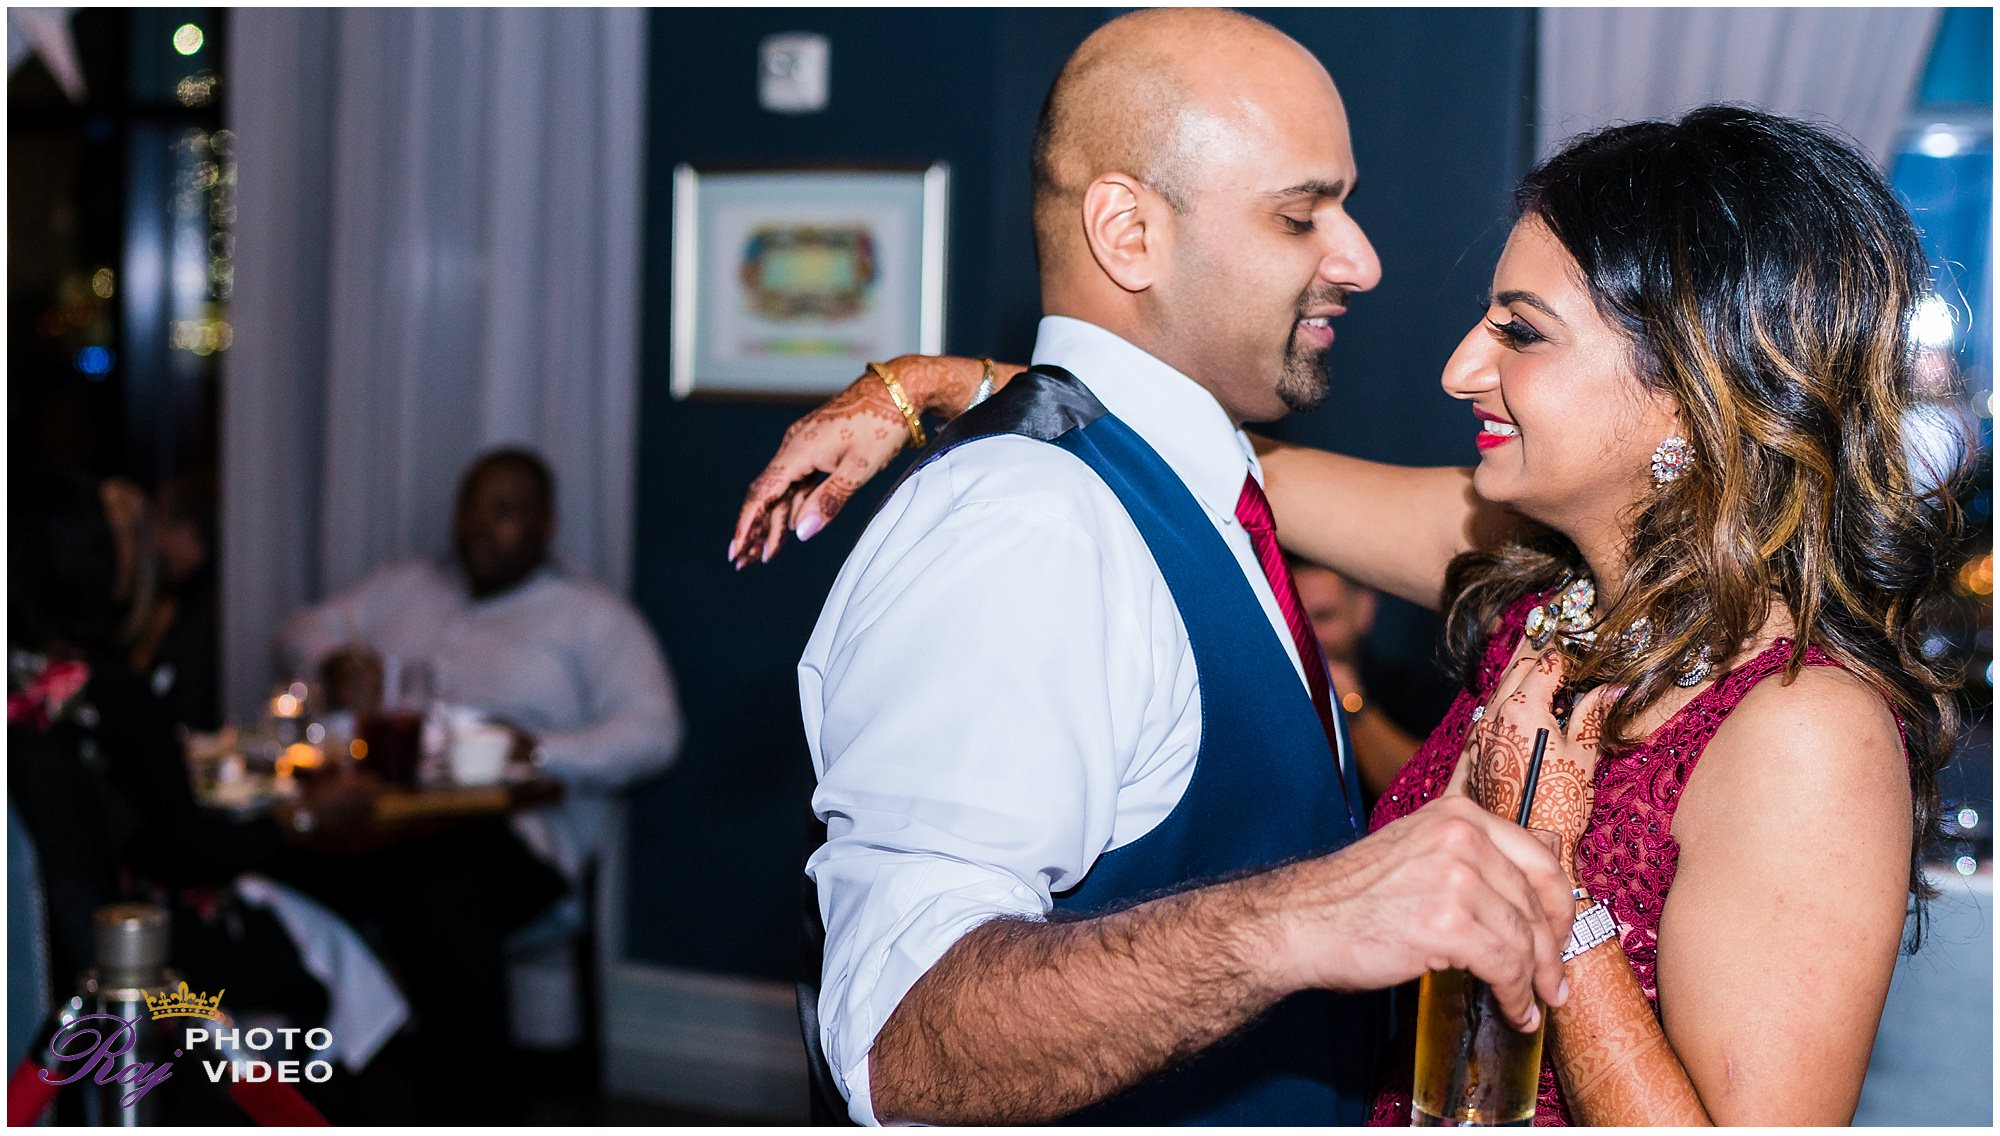 Sri-Guruvaayoorappan-Temple-Marlboro-NJ-Indian-Wedding-Chiyomi-Scott-00048.jpg